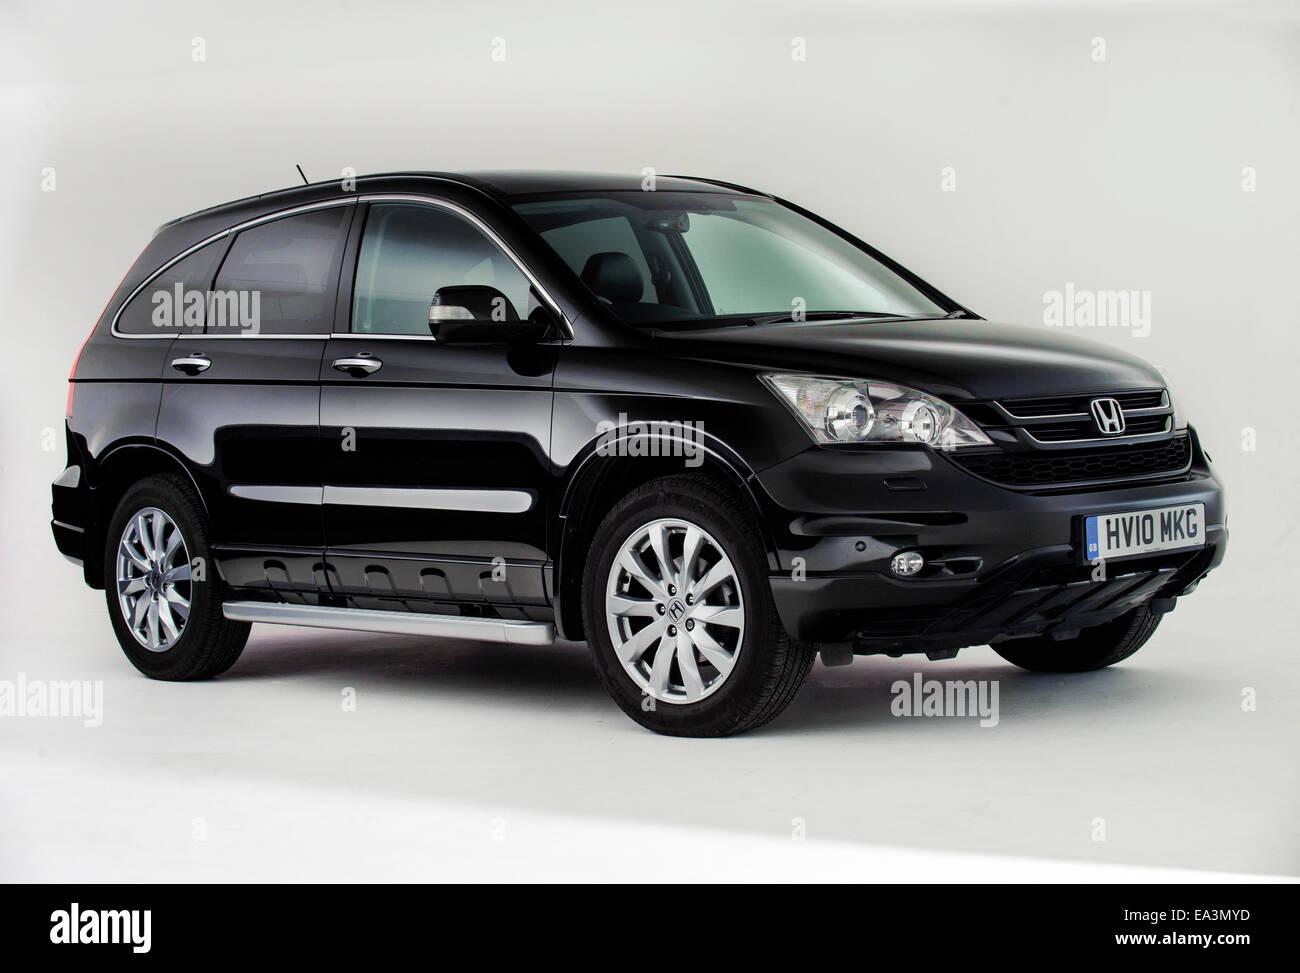 2010 Honda CRV - Stock Image